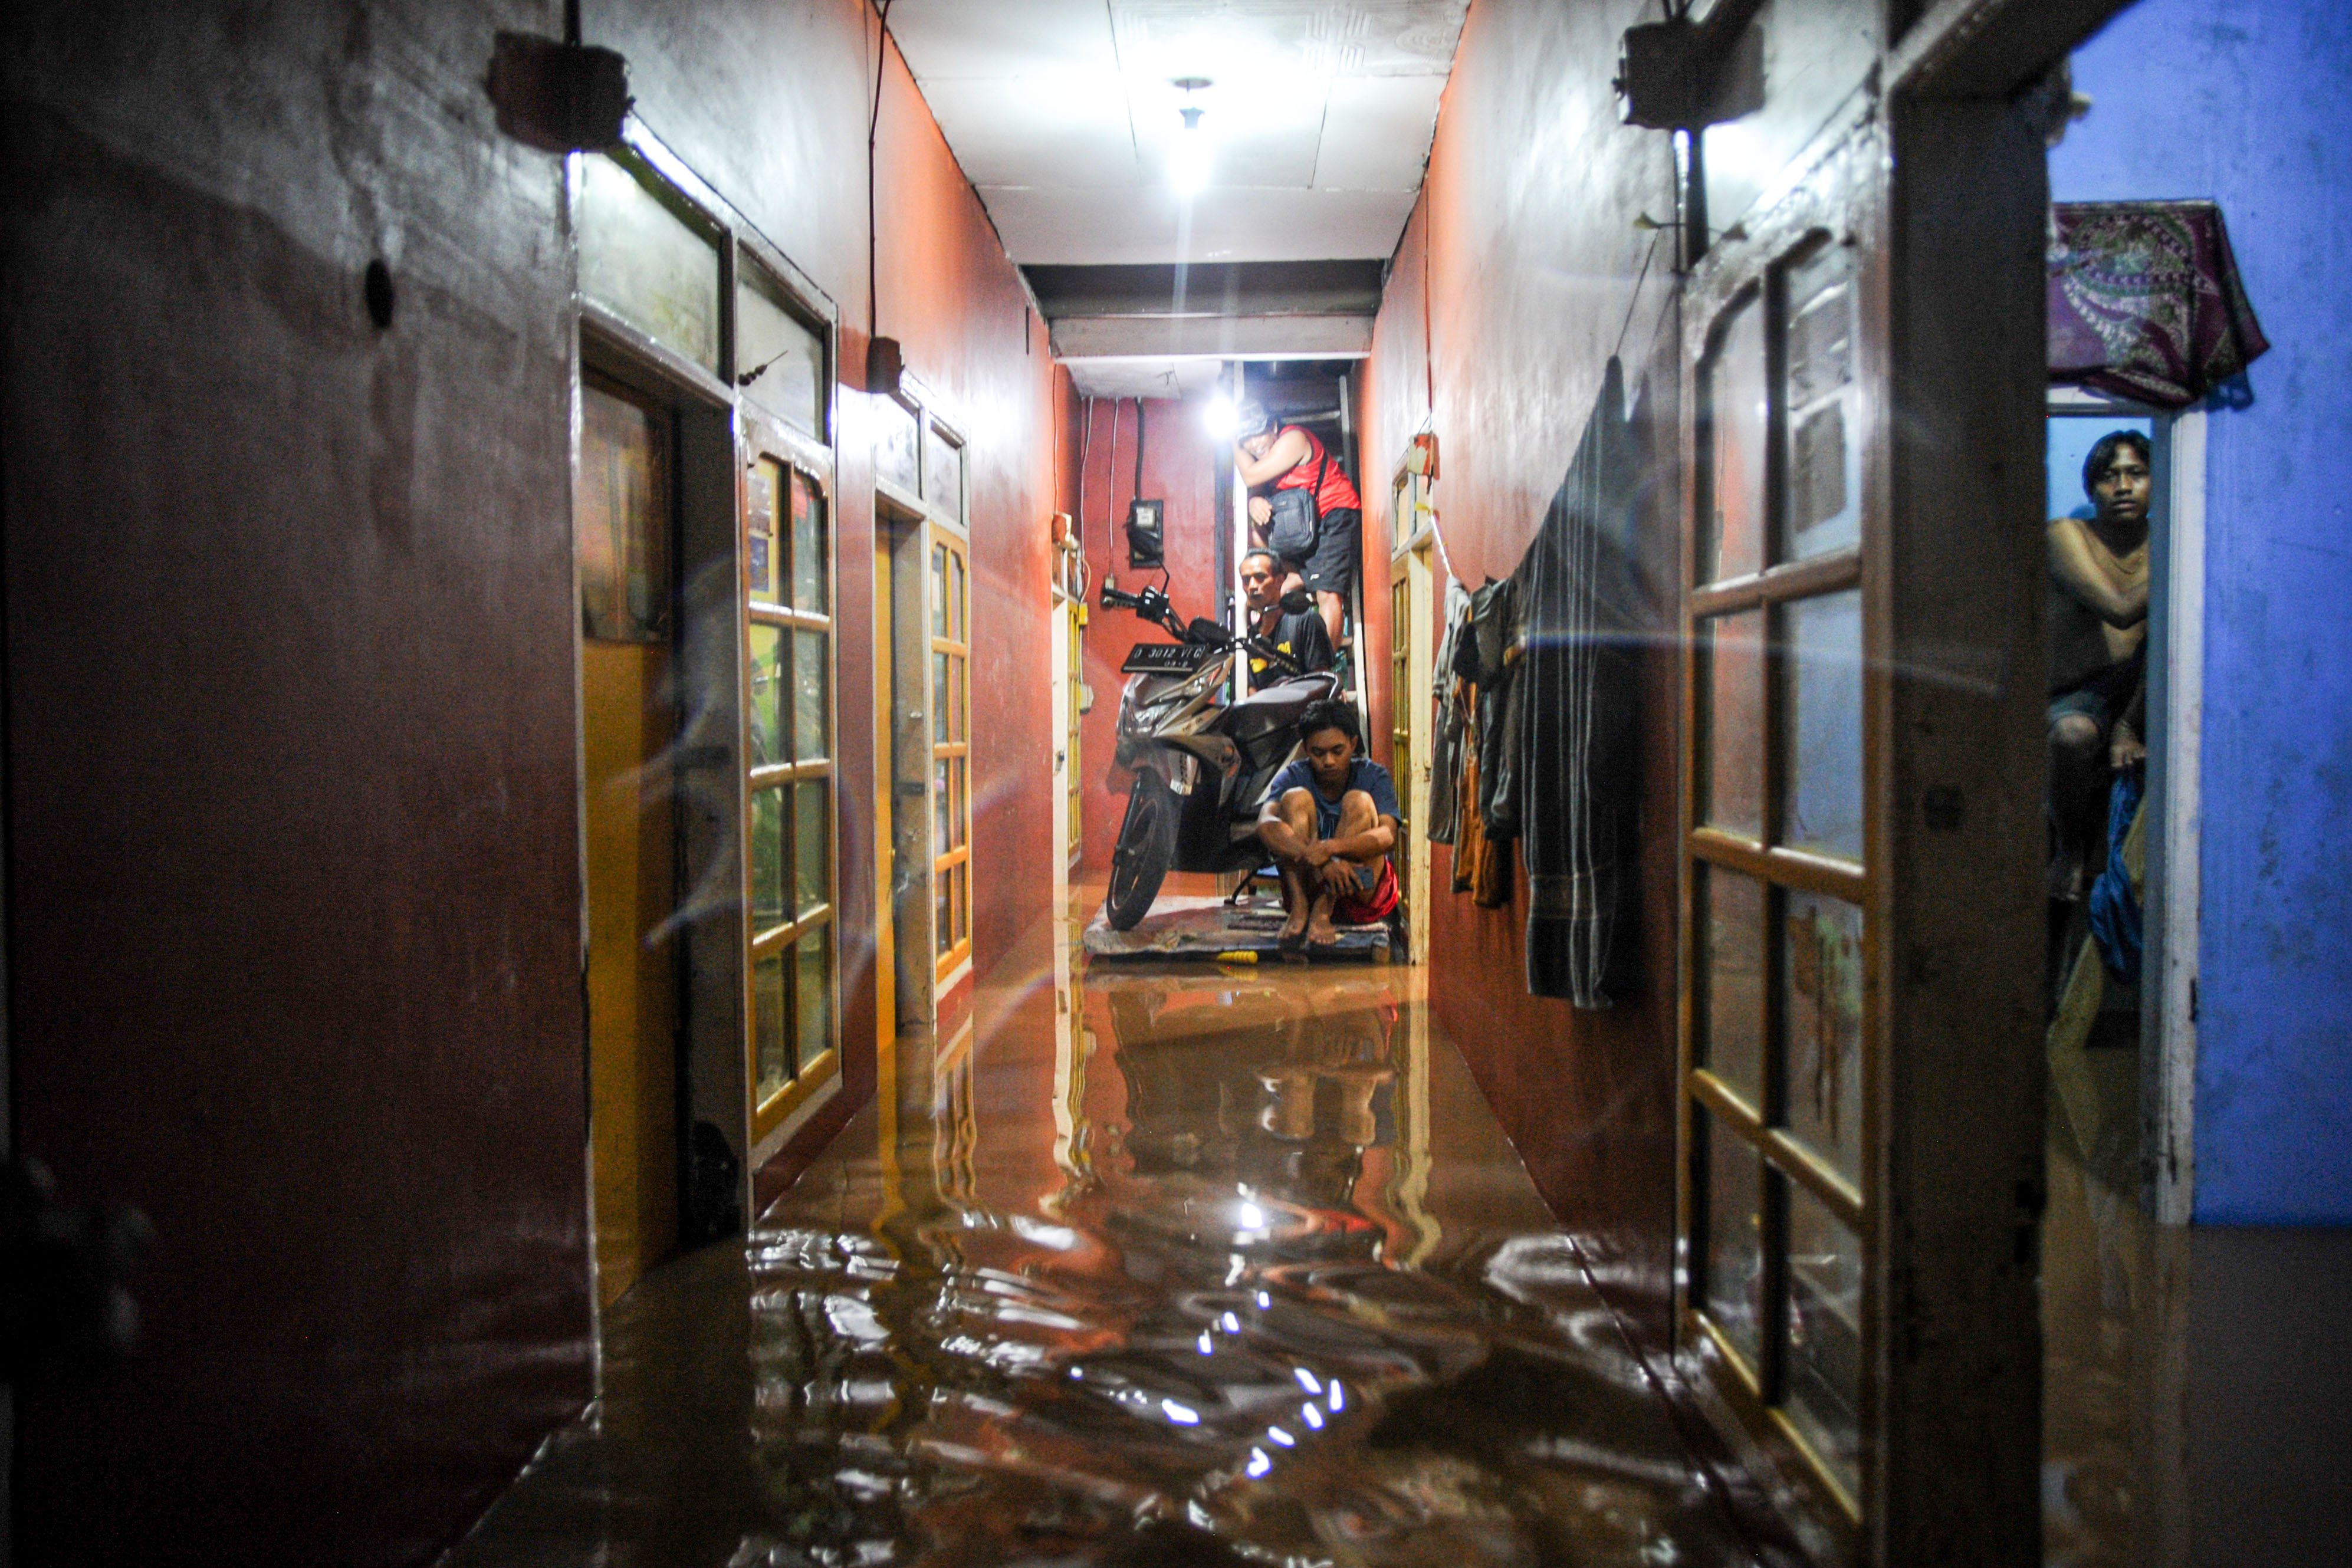 Aktivitas warga saat rumahnya terendam banjir di Dangdeur, Rancaekek, Kabupaten Bandung, Jawa Barat, Sabtu (9/1/2021). Genangan air setinggi 60 hingga 150 sentimeter membanjiri puluhan permukiman warga di Rancaekek akibat hujan lebat yang mengguyur Bandung Raya pada Sabtu (9/1) siang hingga sore hari.